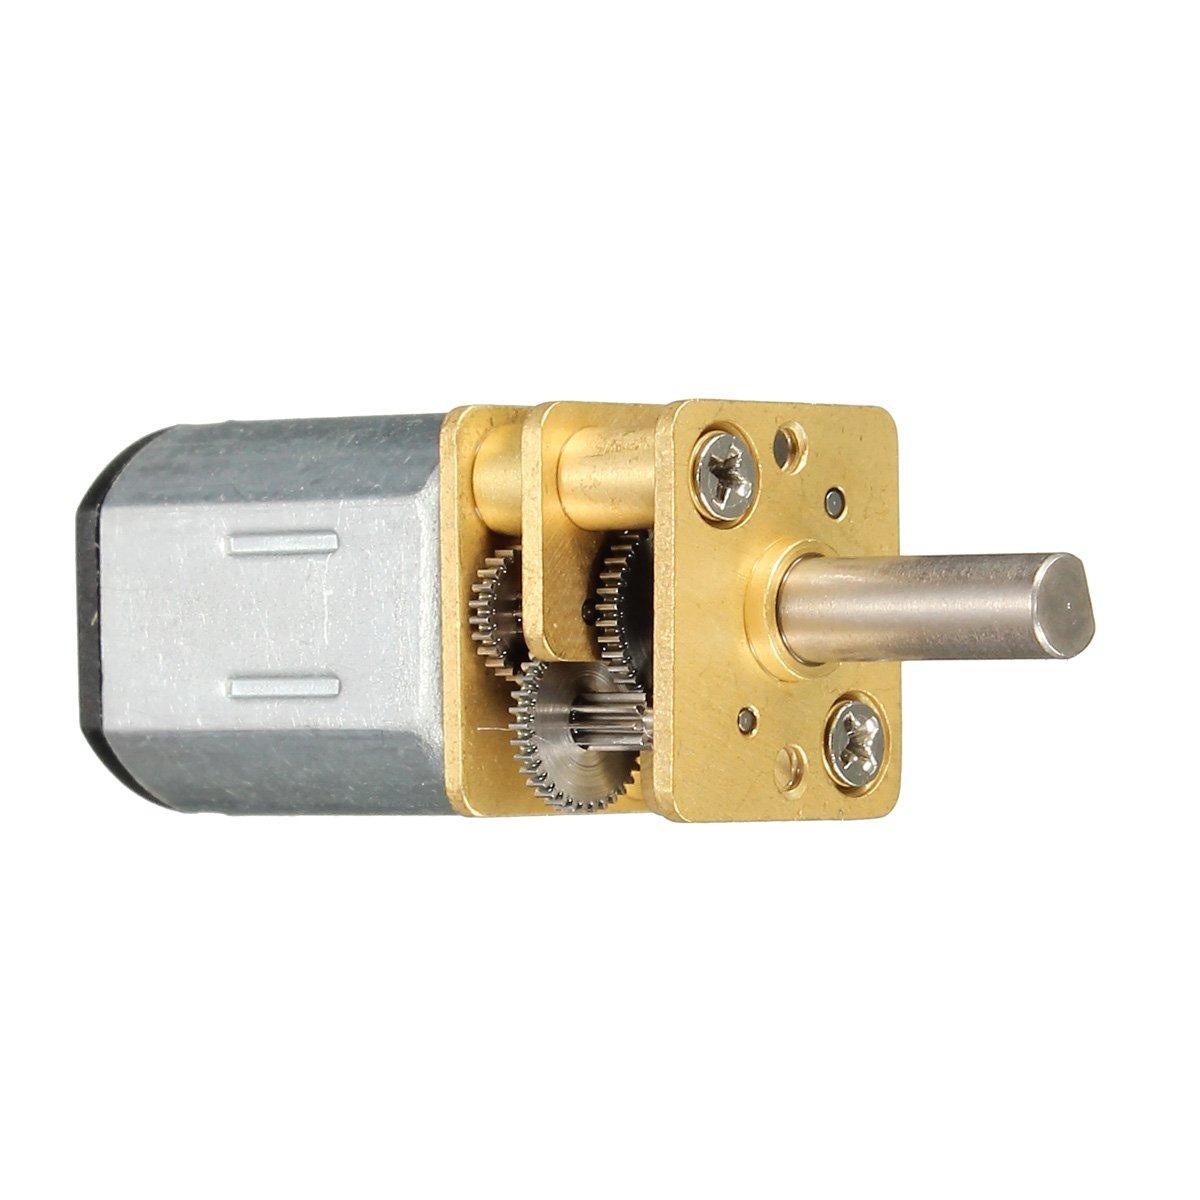 N20-6V-200 RPM Micro Metal Gear-box DC Motor